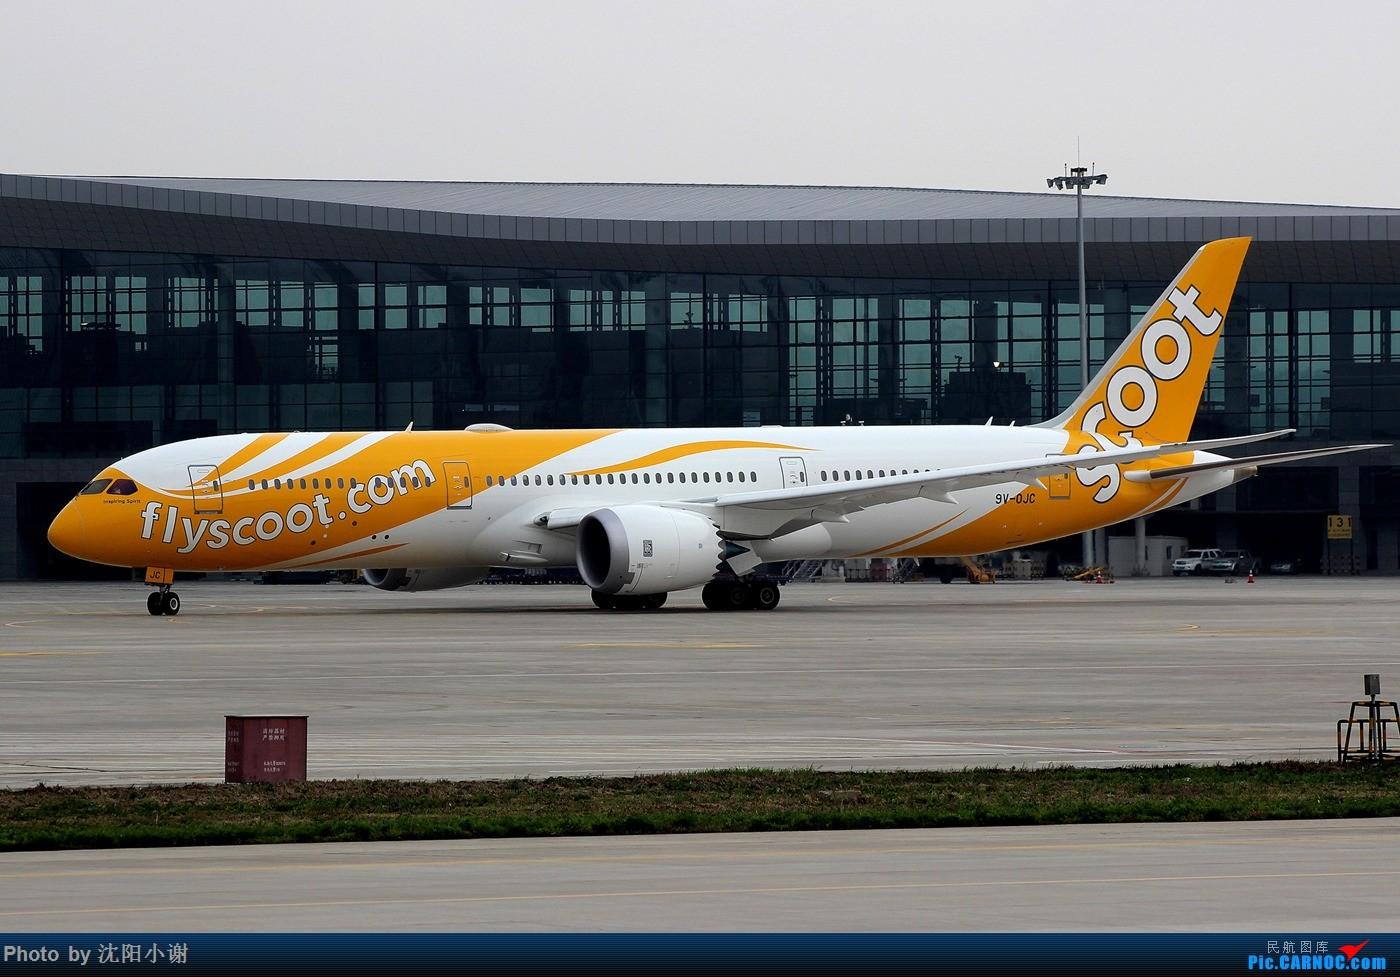 ��k��n�9ojzd��c�����f_boeing 787-9 9v-ojc 中国沈阳桃仙国际机场